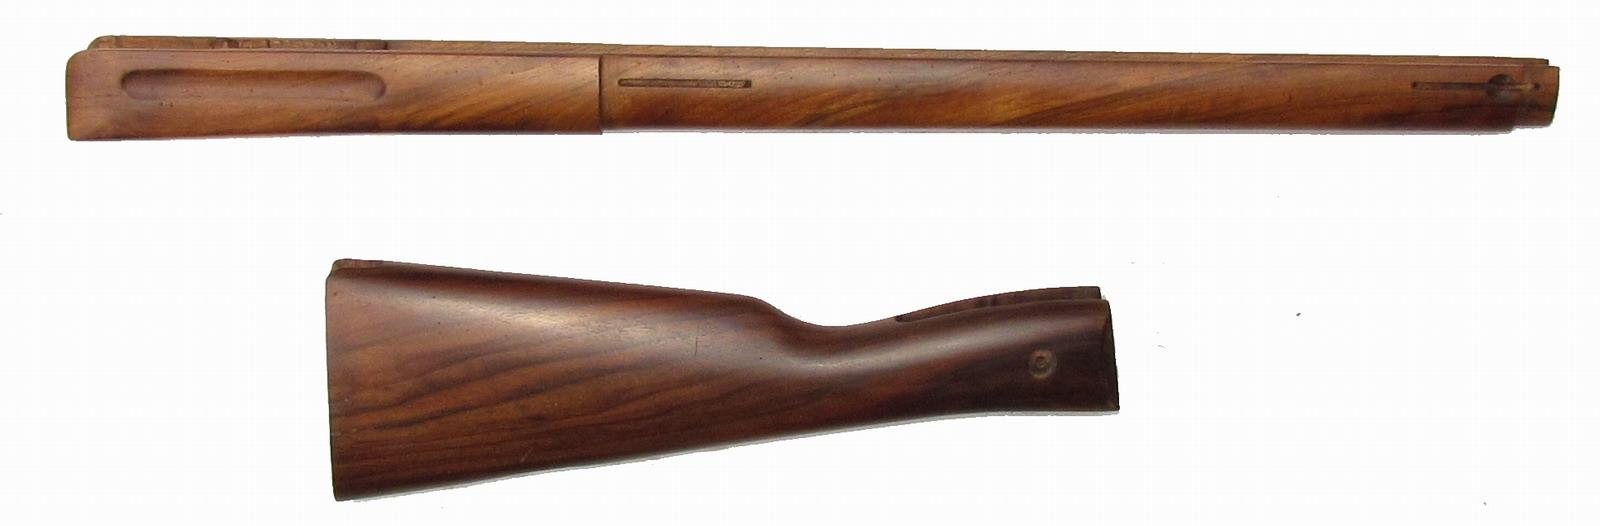 GRAS Mod 1874 recalibré chasse - Page 2 IMG_0182